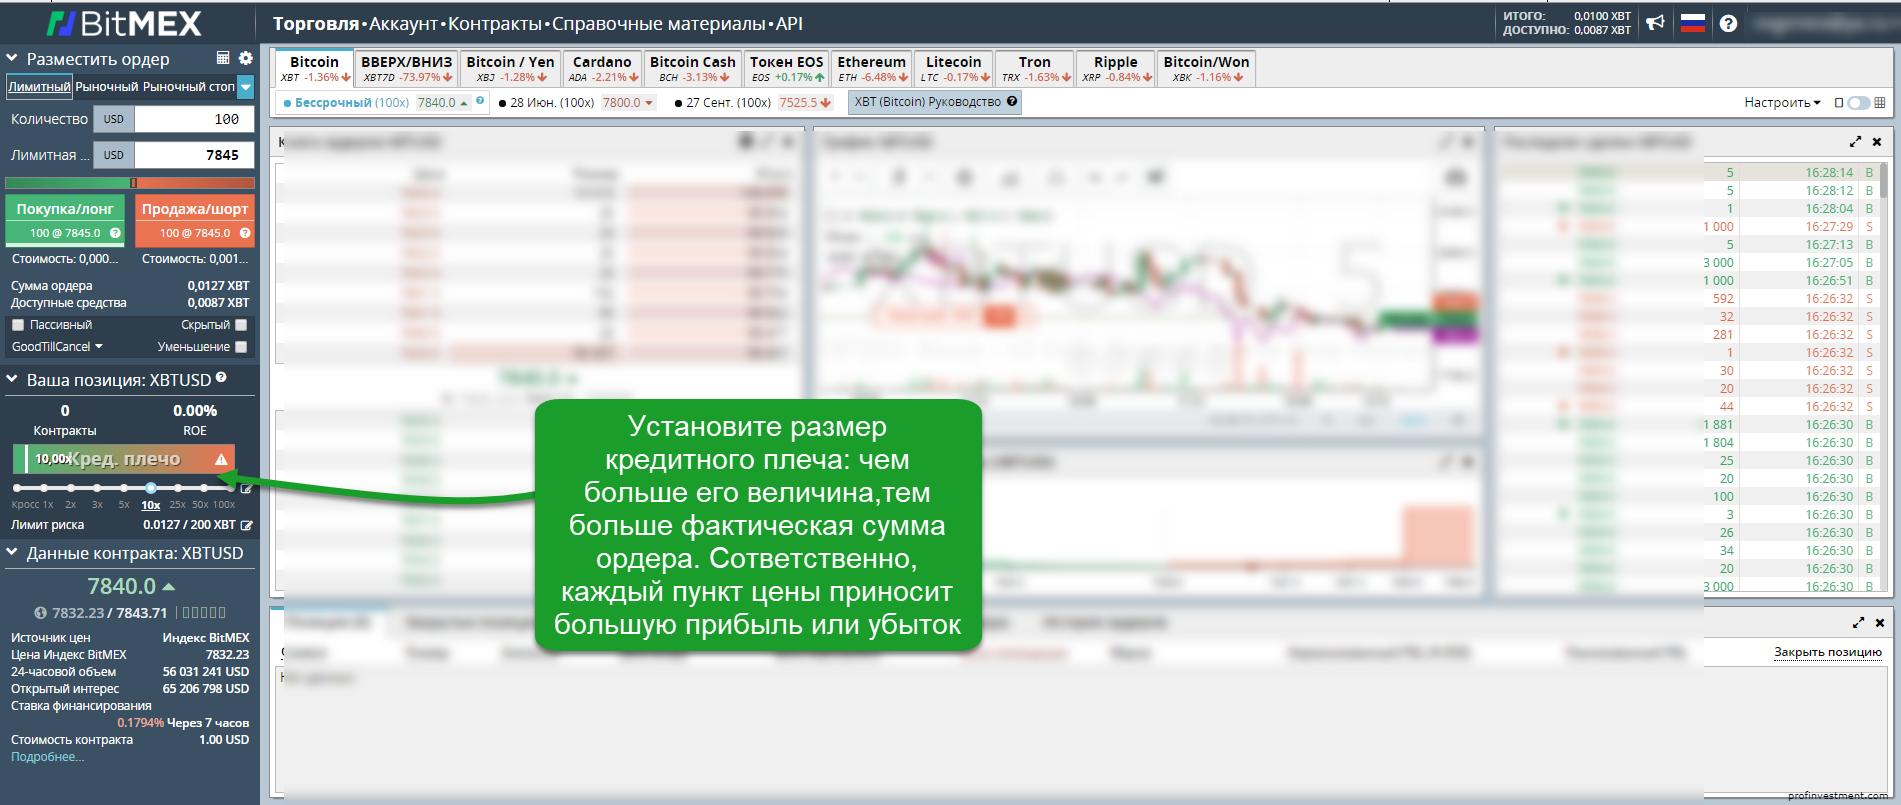 установка кредитного плеча на бирже Bitmex